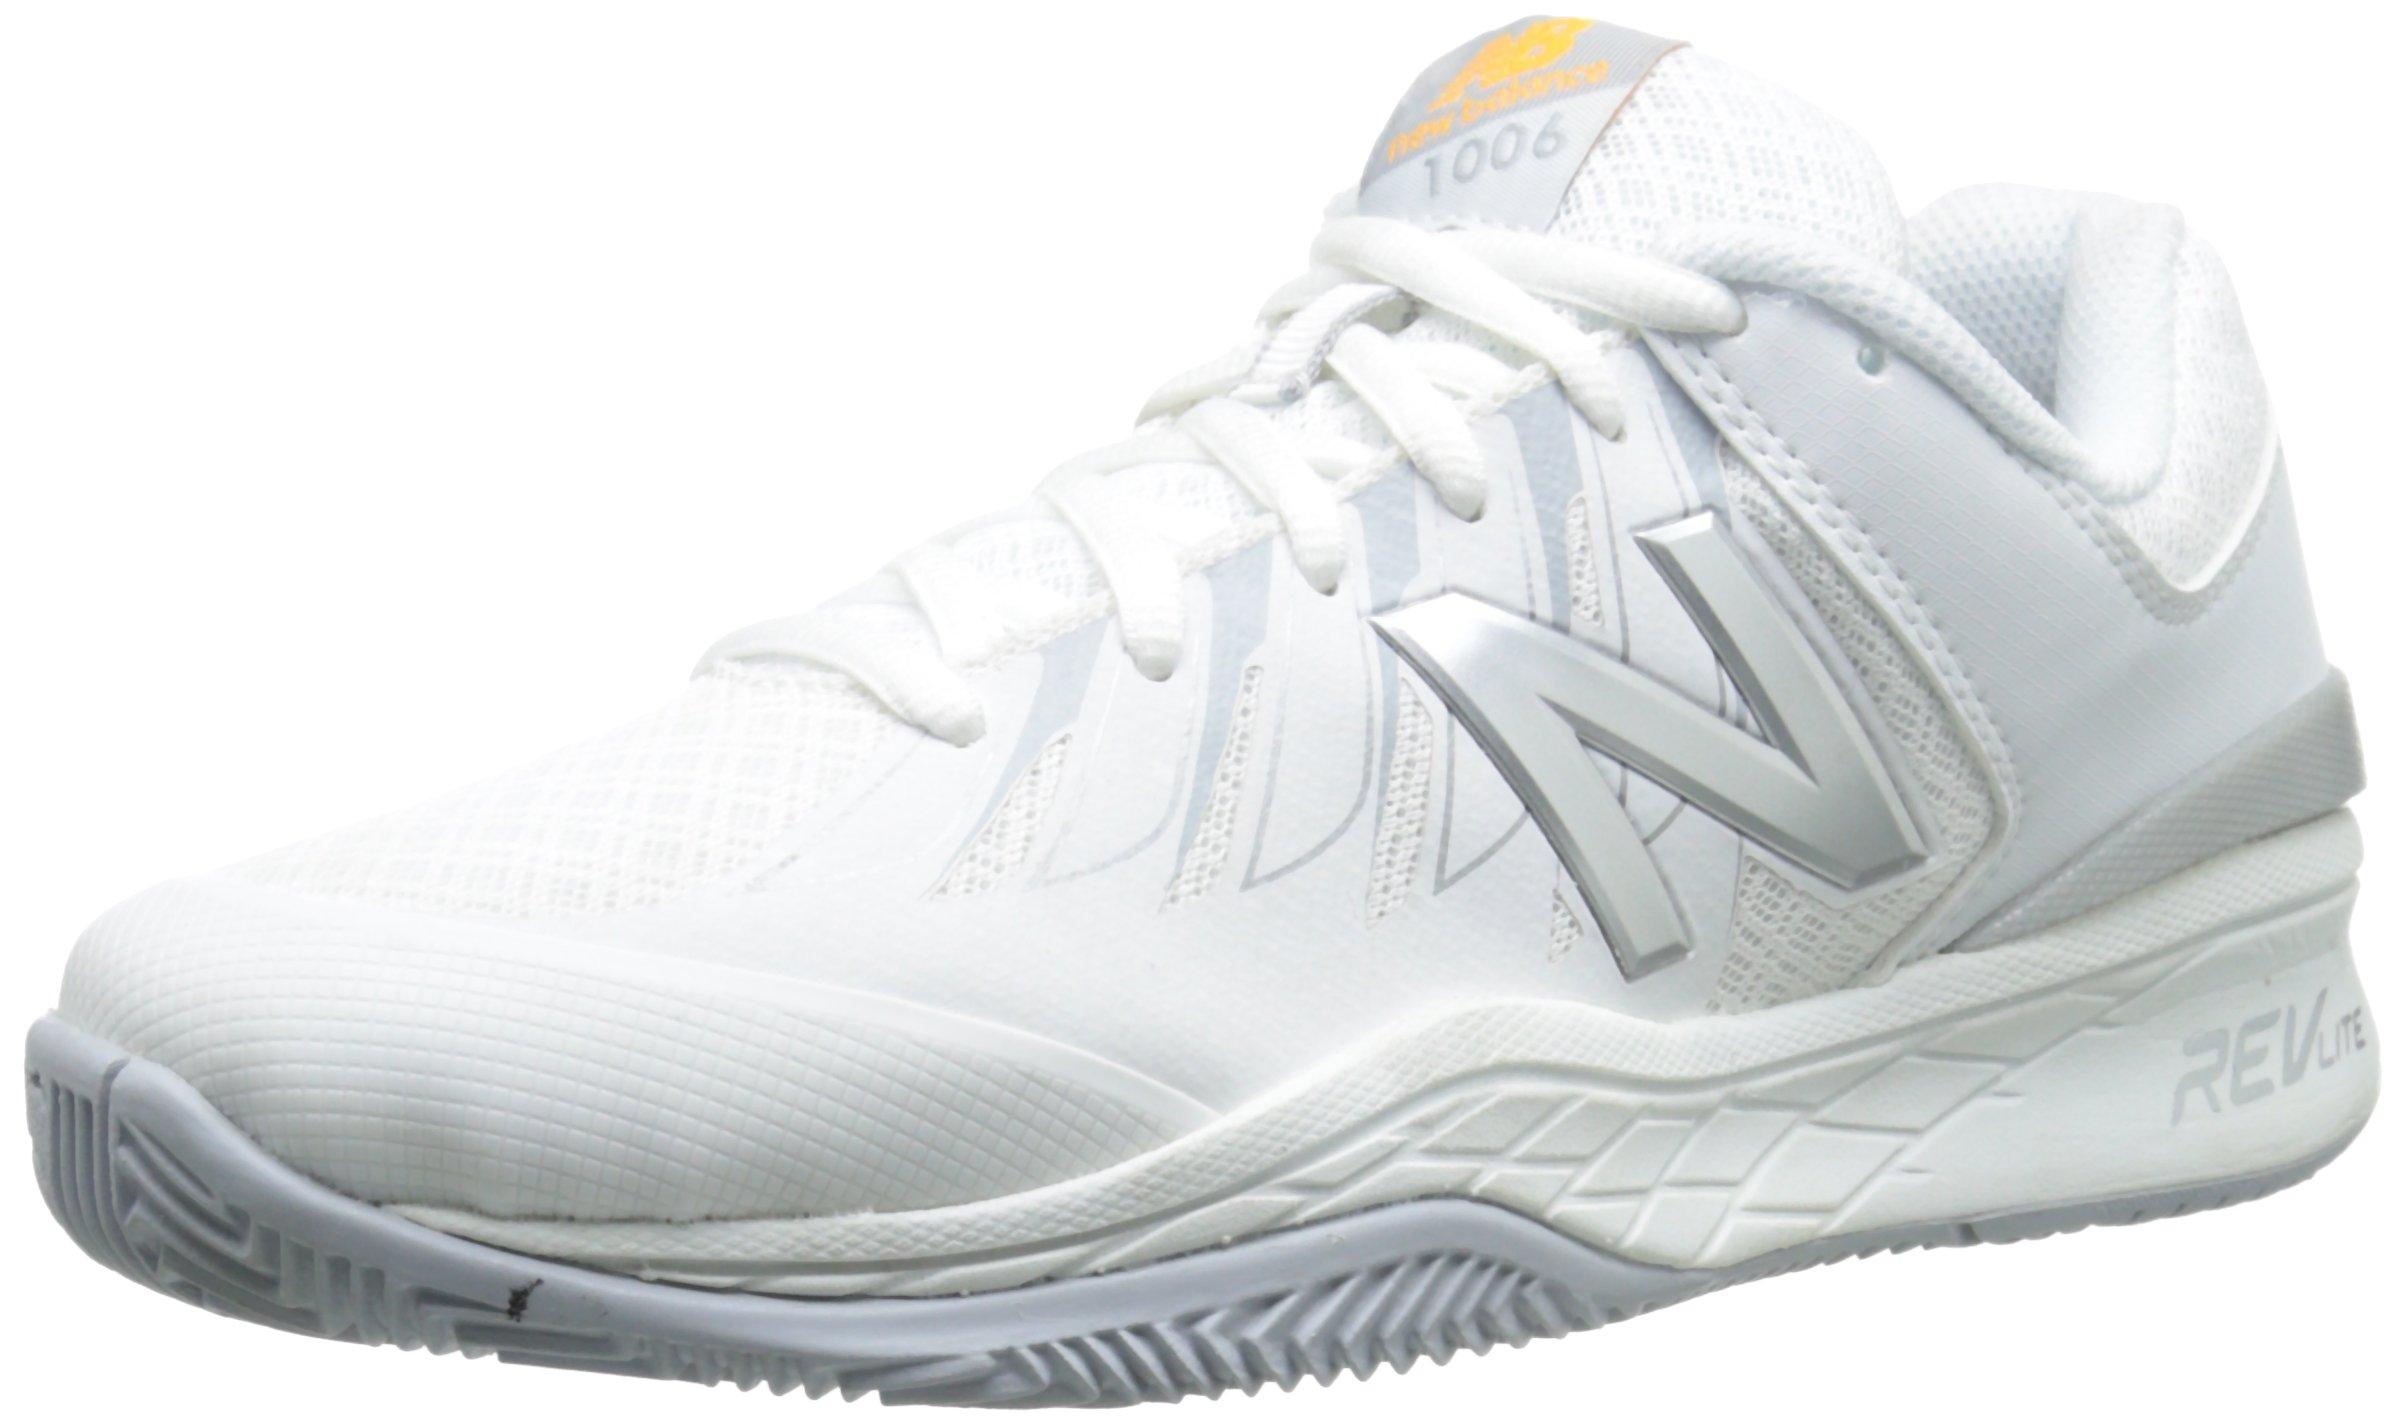 New Balance Women's WC1006v1 Tennis Shoe, White/Silver, 8.5 D US